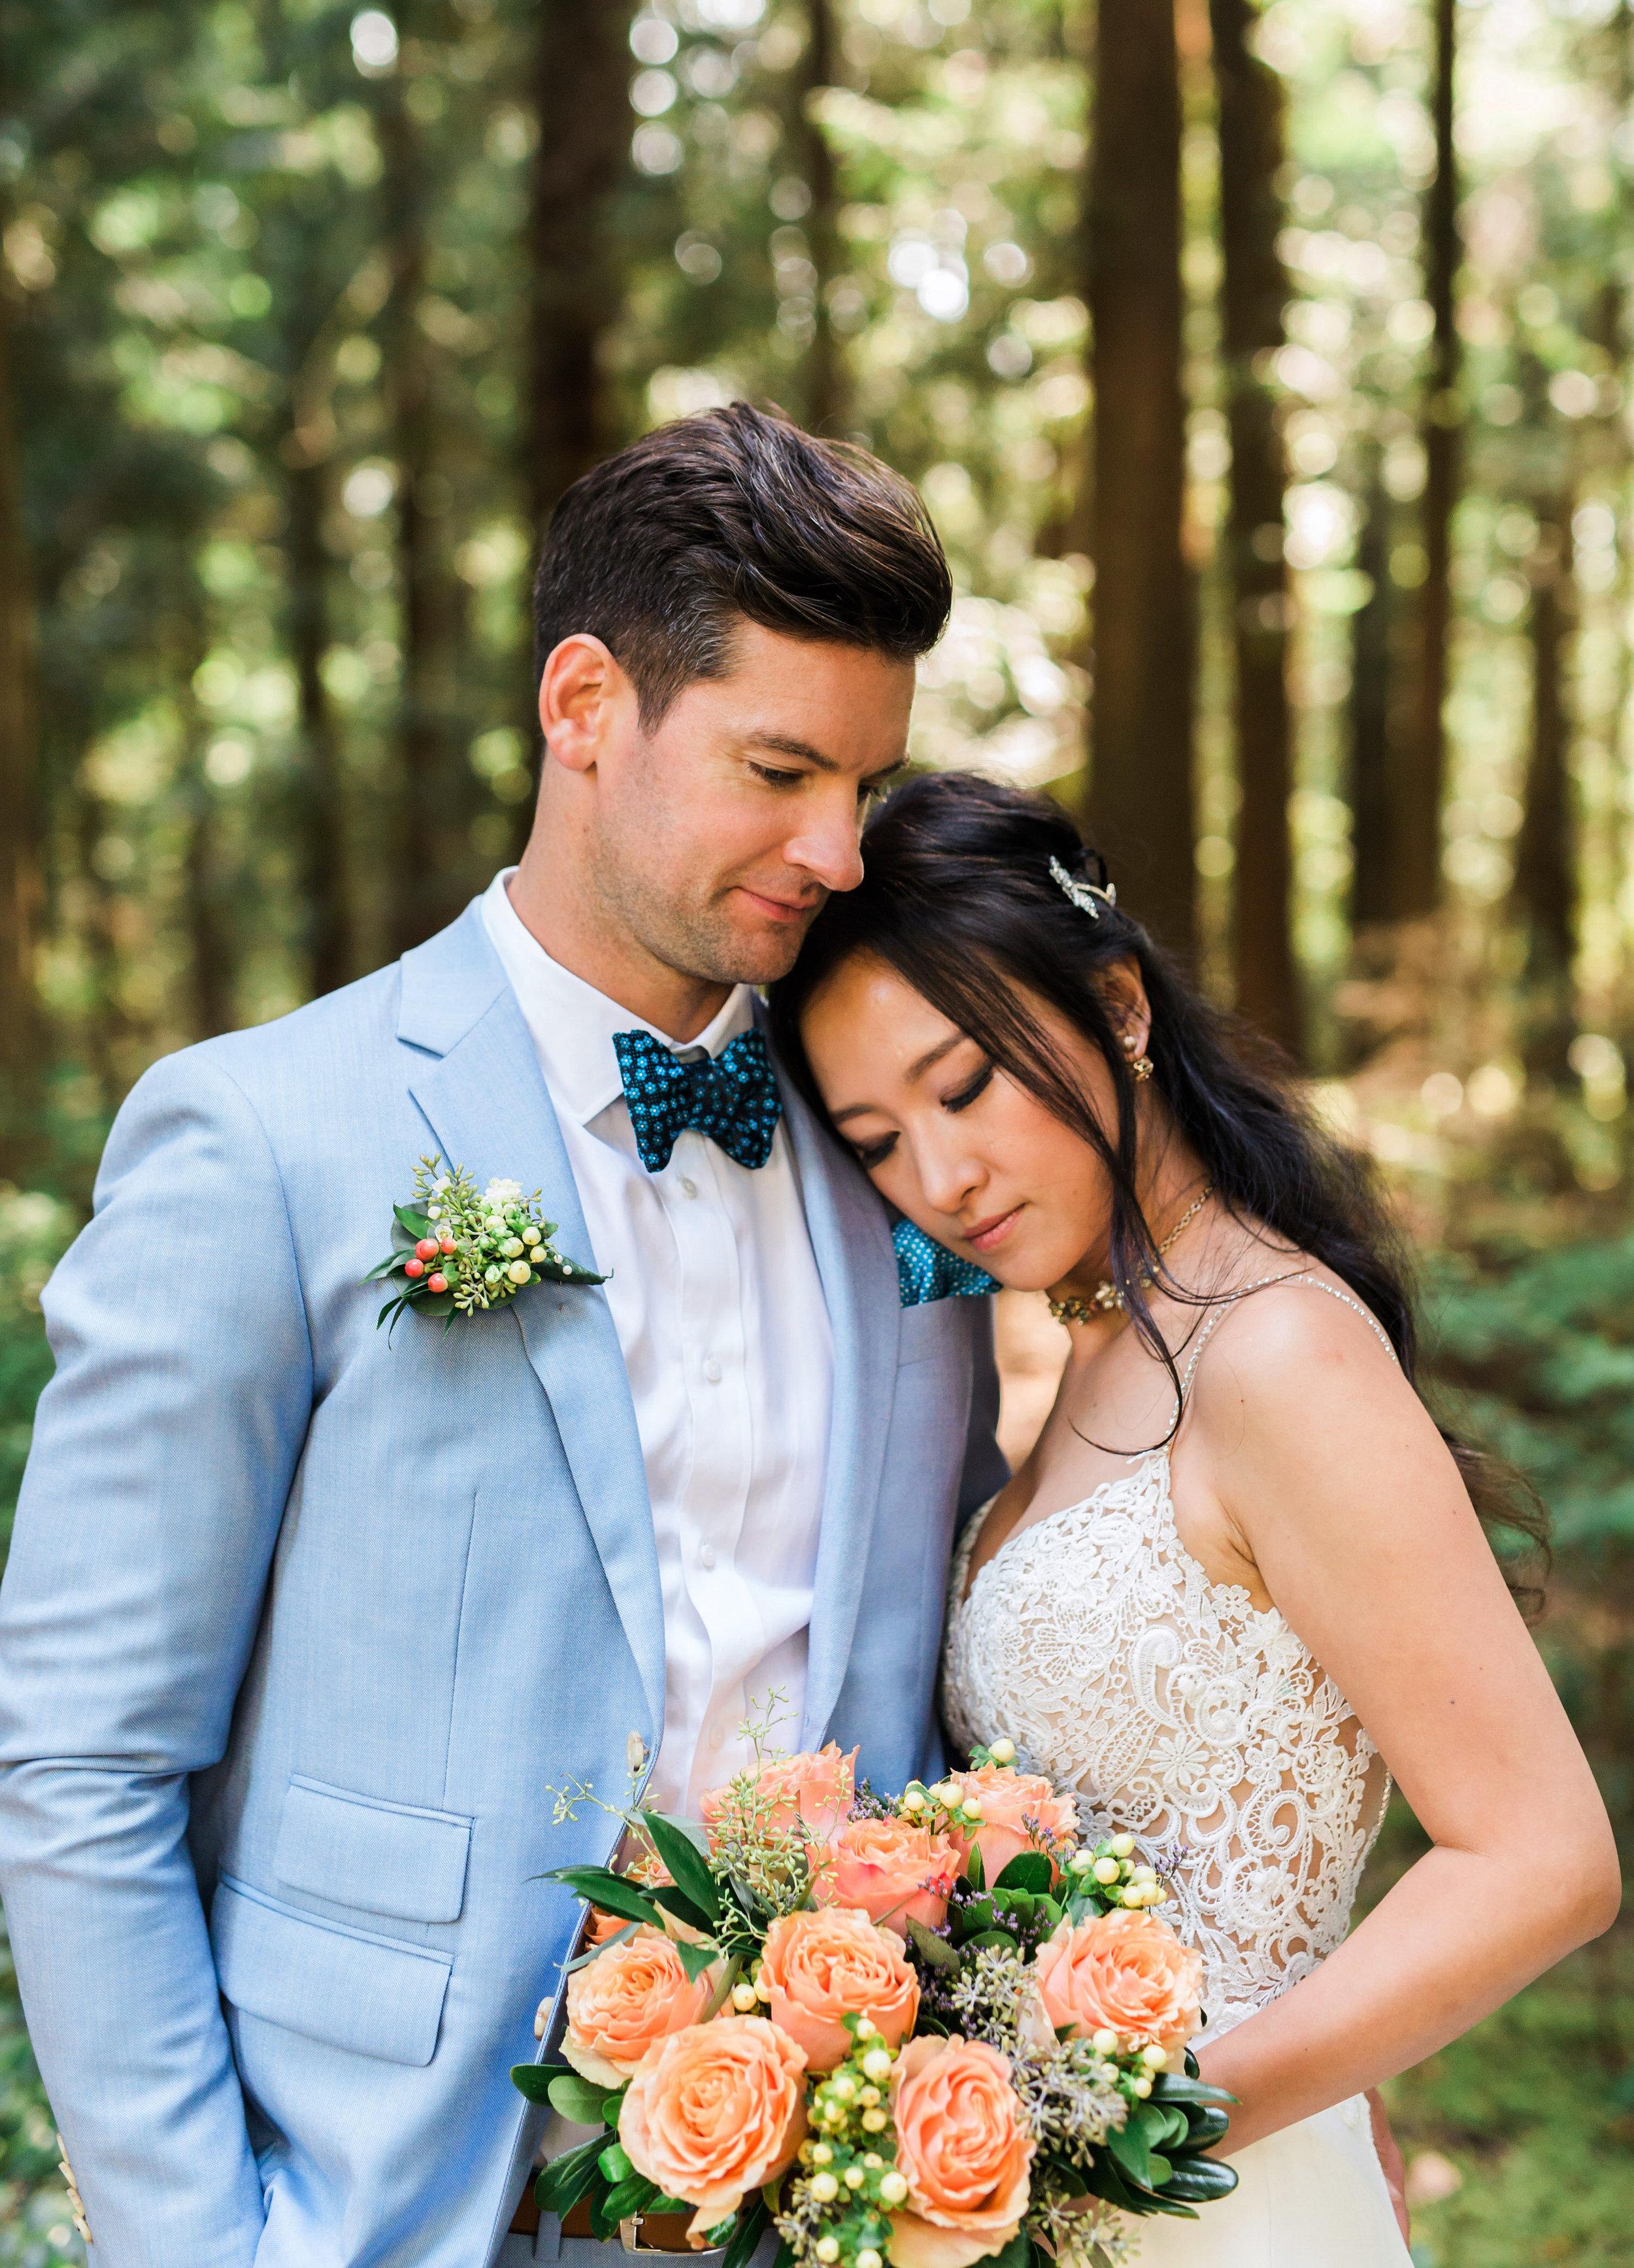 Linwood House Wedding Photos - Roberts Creek Wedding Photos - Vancouver Wedding Photographer & Videographer - Sunshine Coast Wedding Photos - Sunshine Coast Wedding Photographer - Jennifer Picard Photography - IMG_7567.jpg